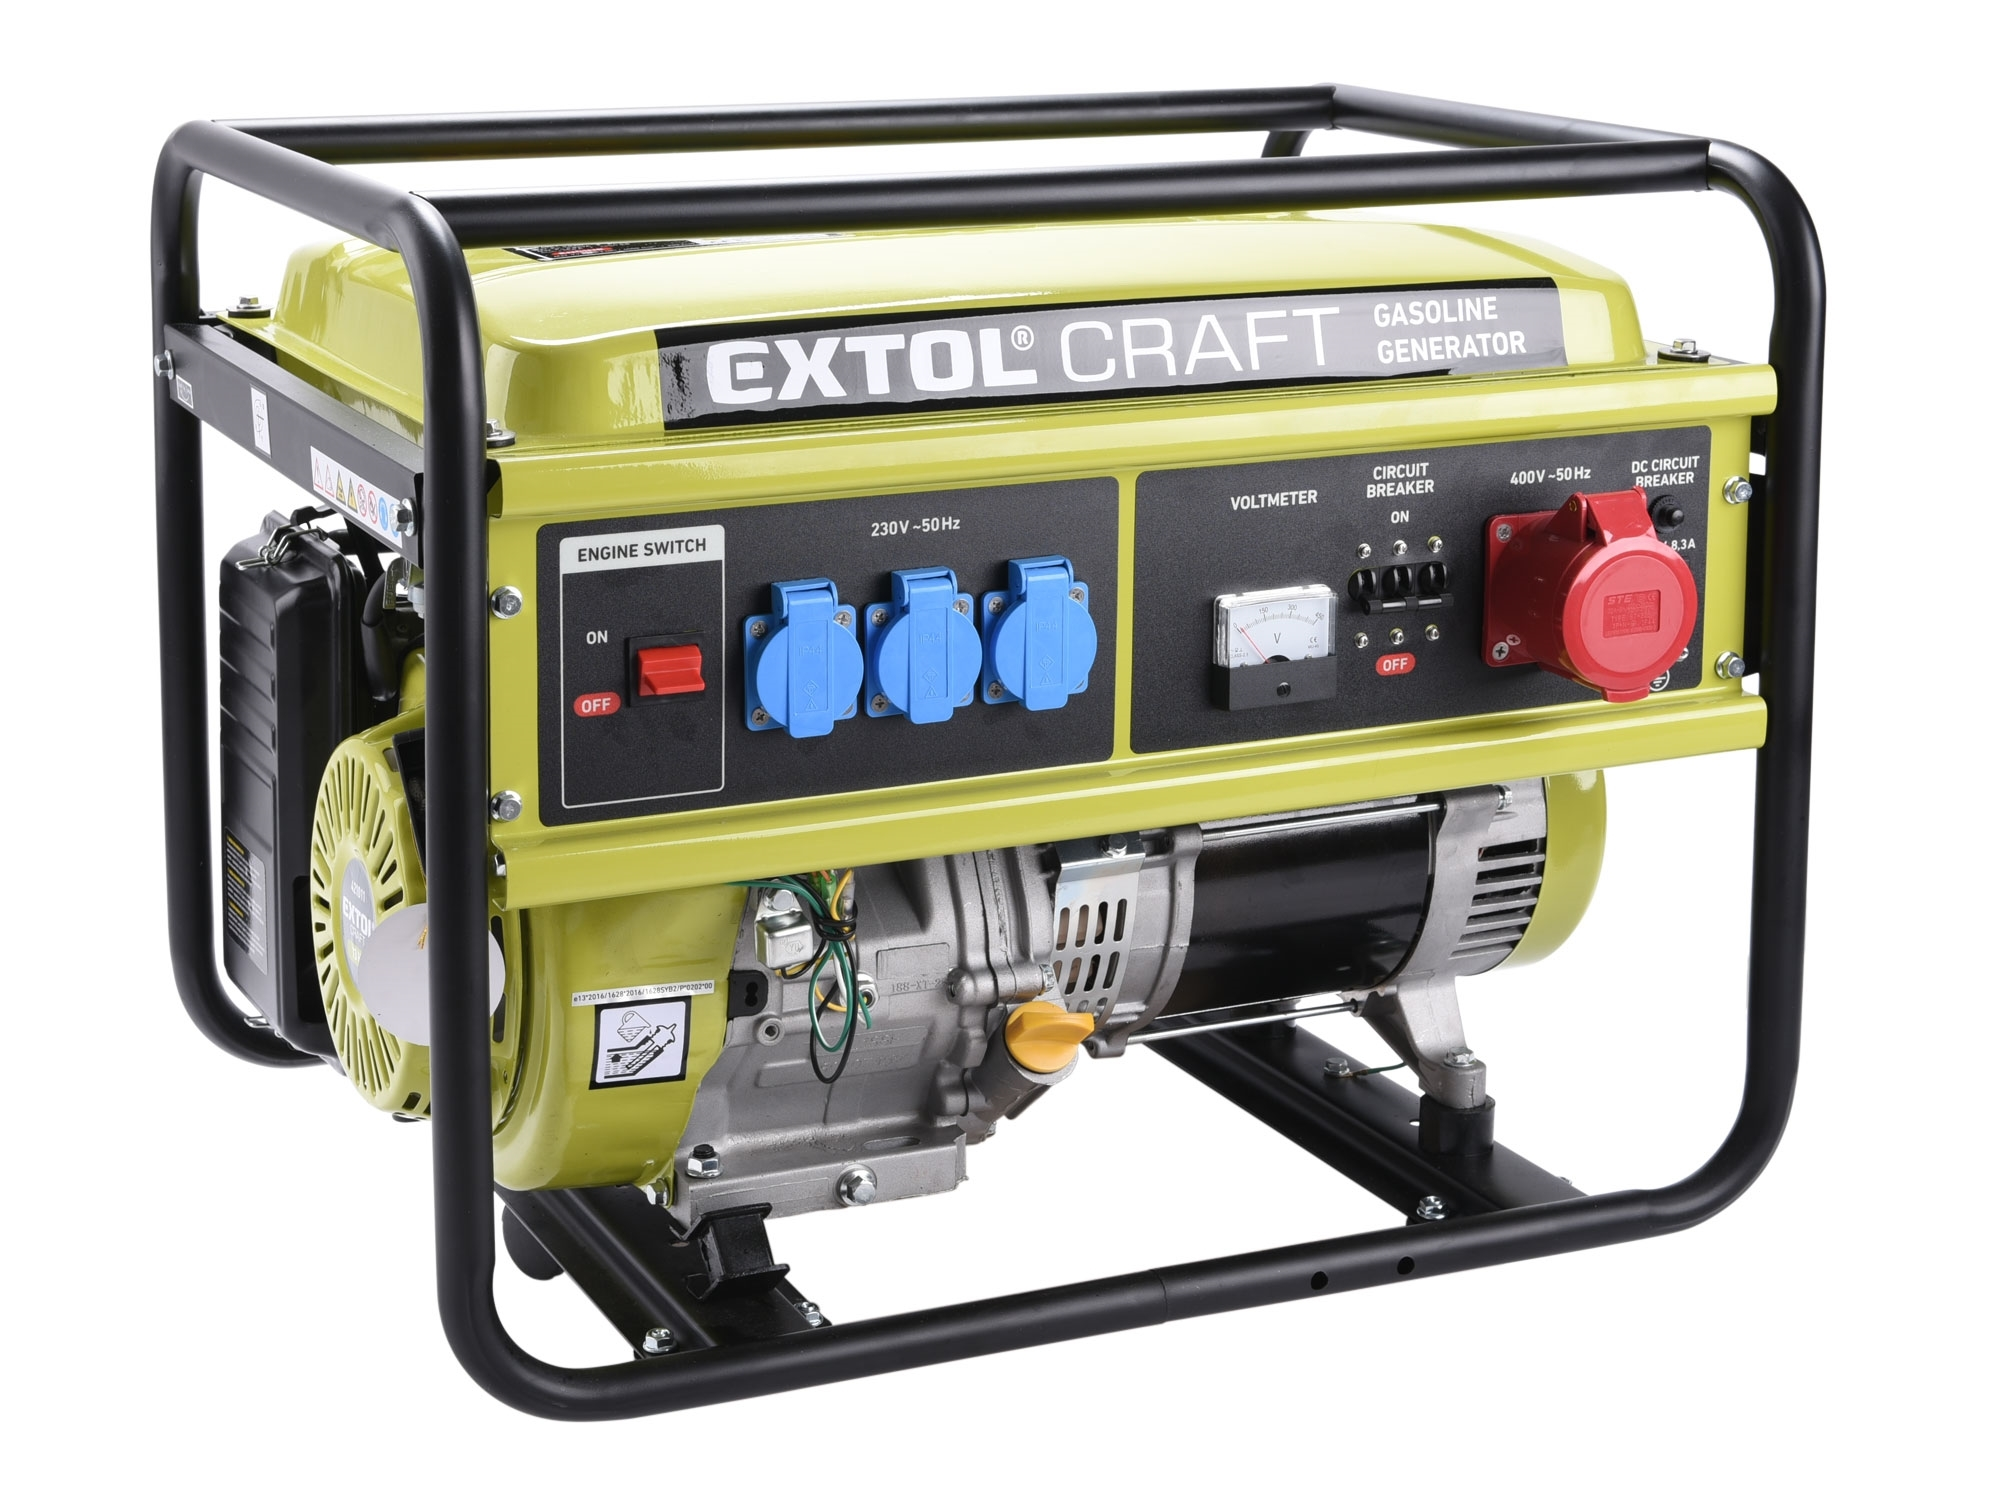 elektrocentrála benzínová, 13HP/5,5kW (400V) 3x1,8kW (230V), EXTOL CRAFT 421011